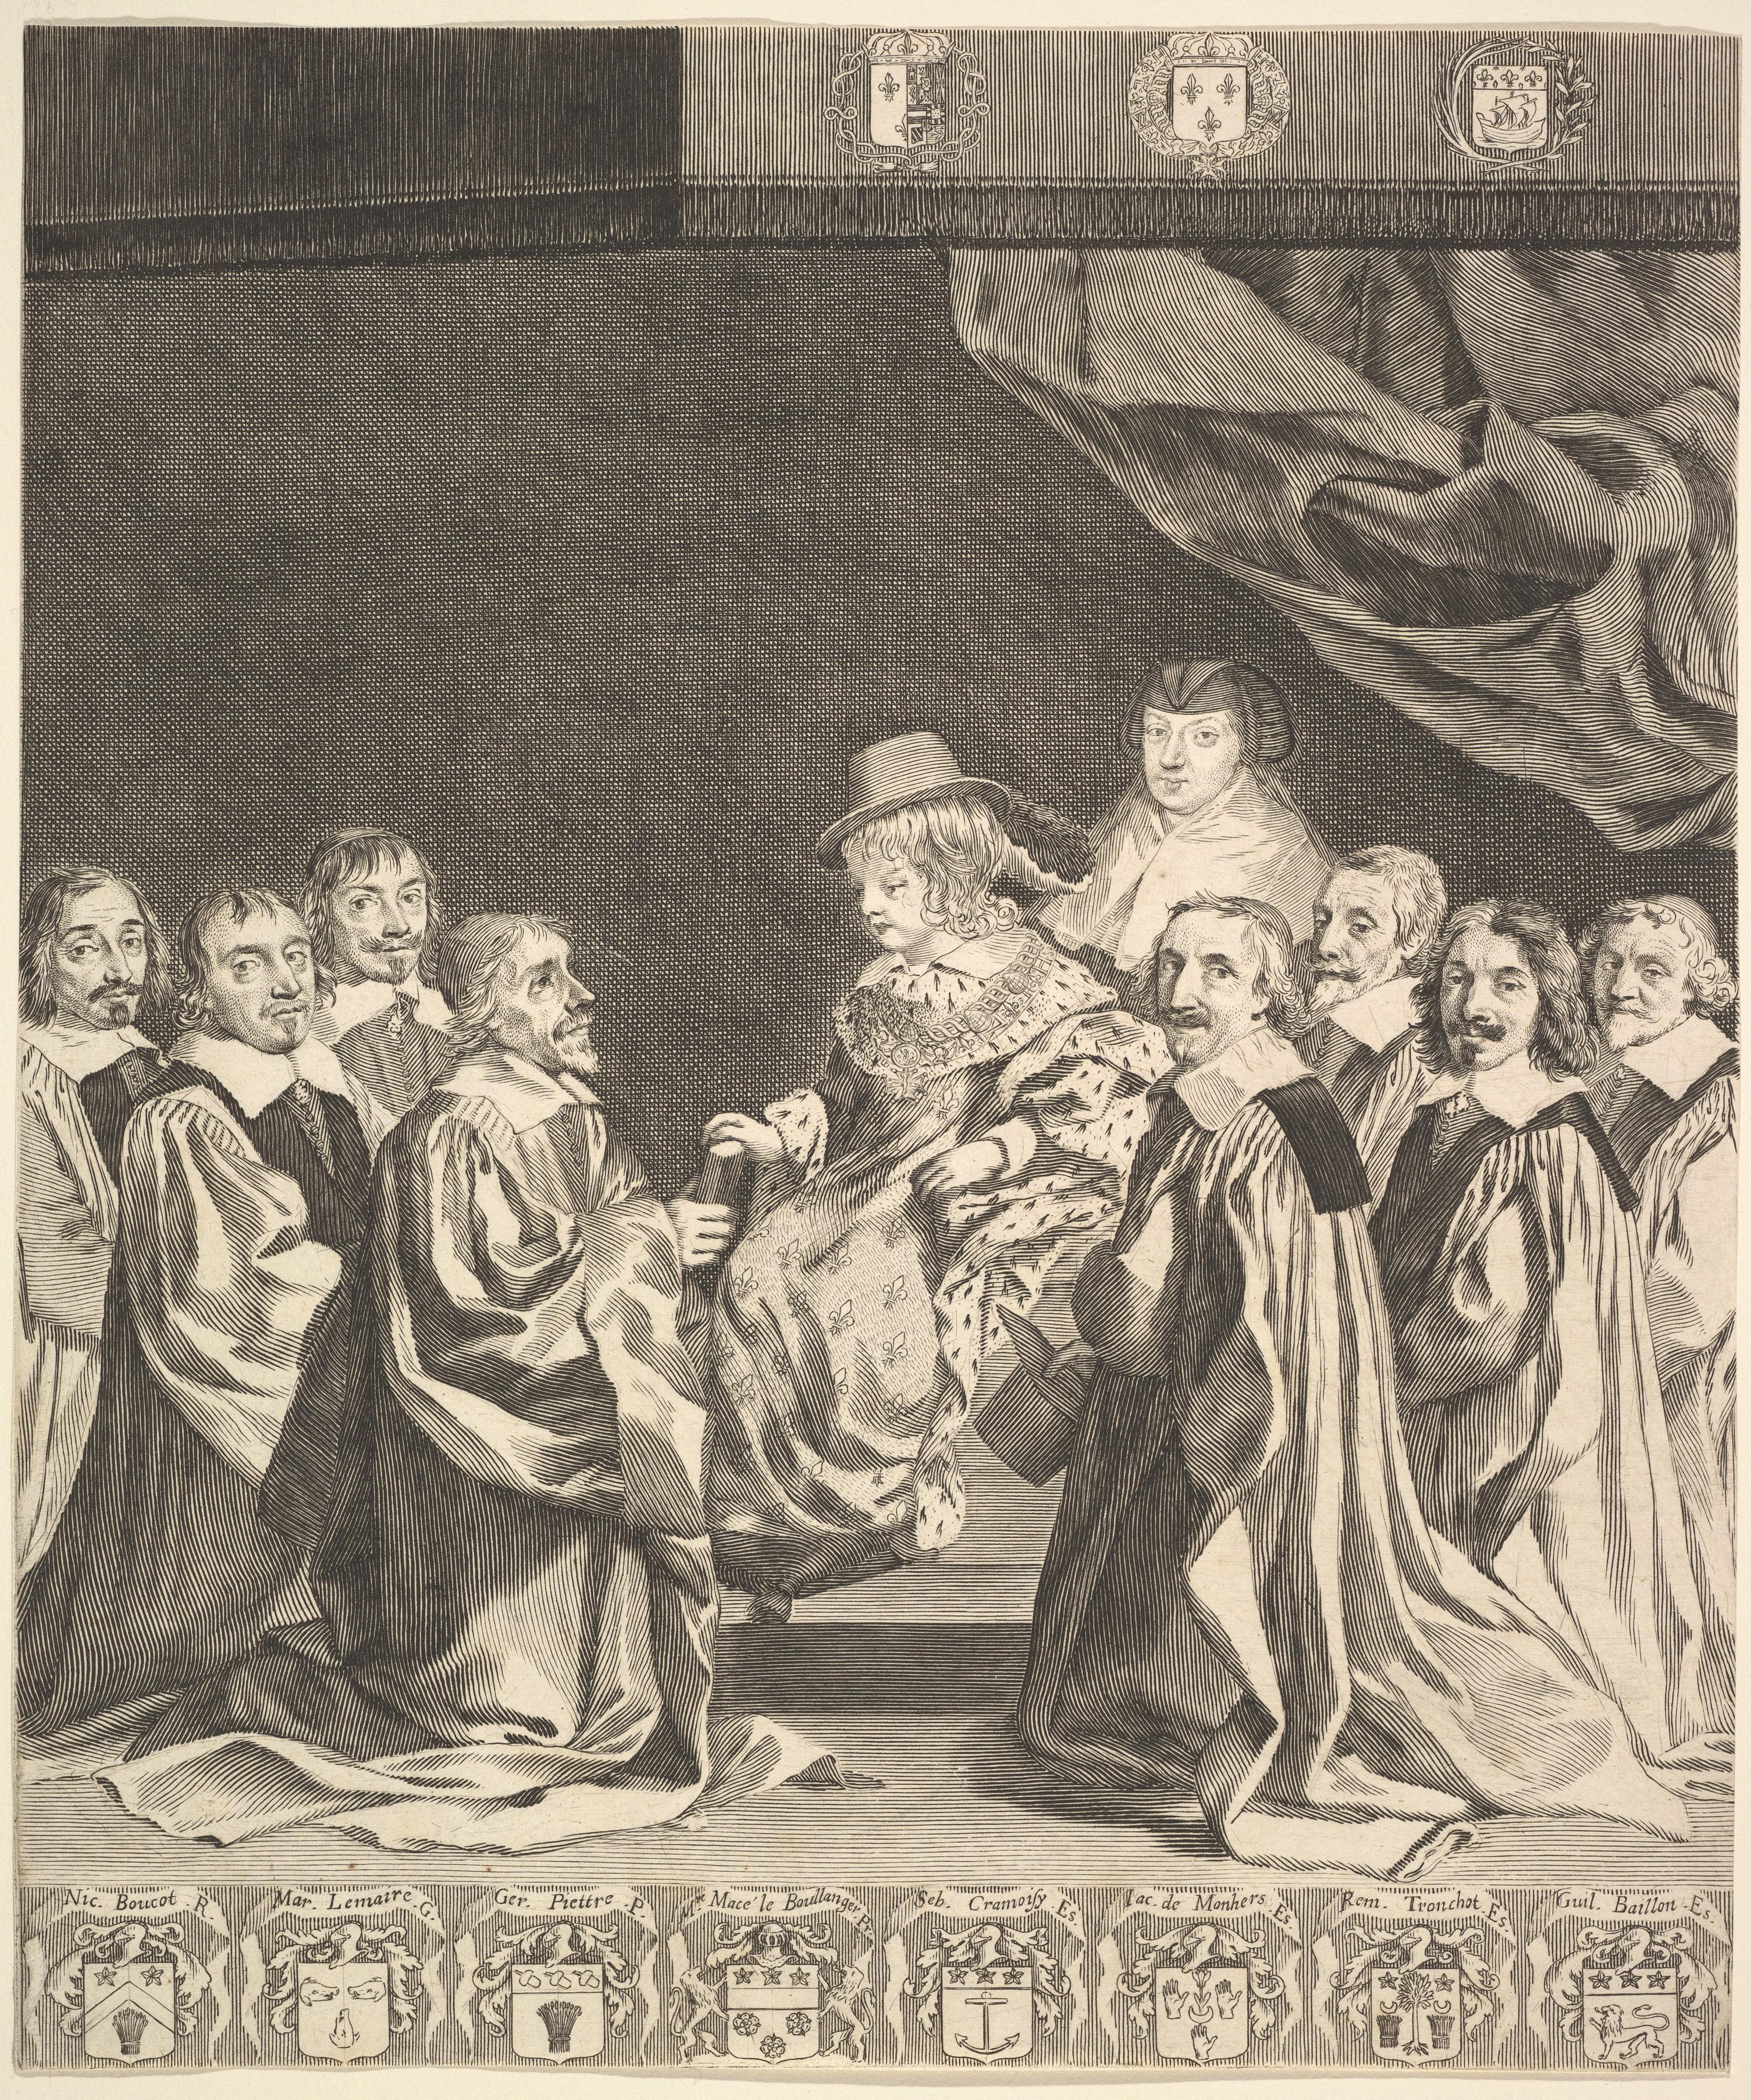 File:Claude Mellan, Frontispiece - Les Ordonnances royaux, ca. 1644.jpg